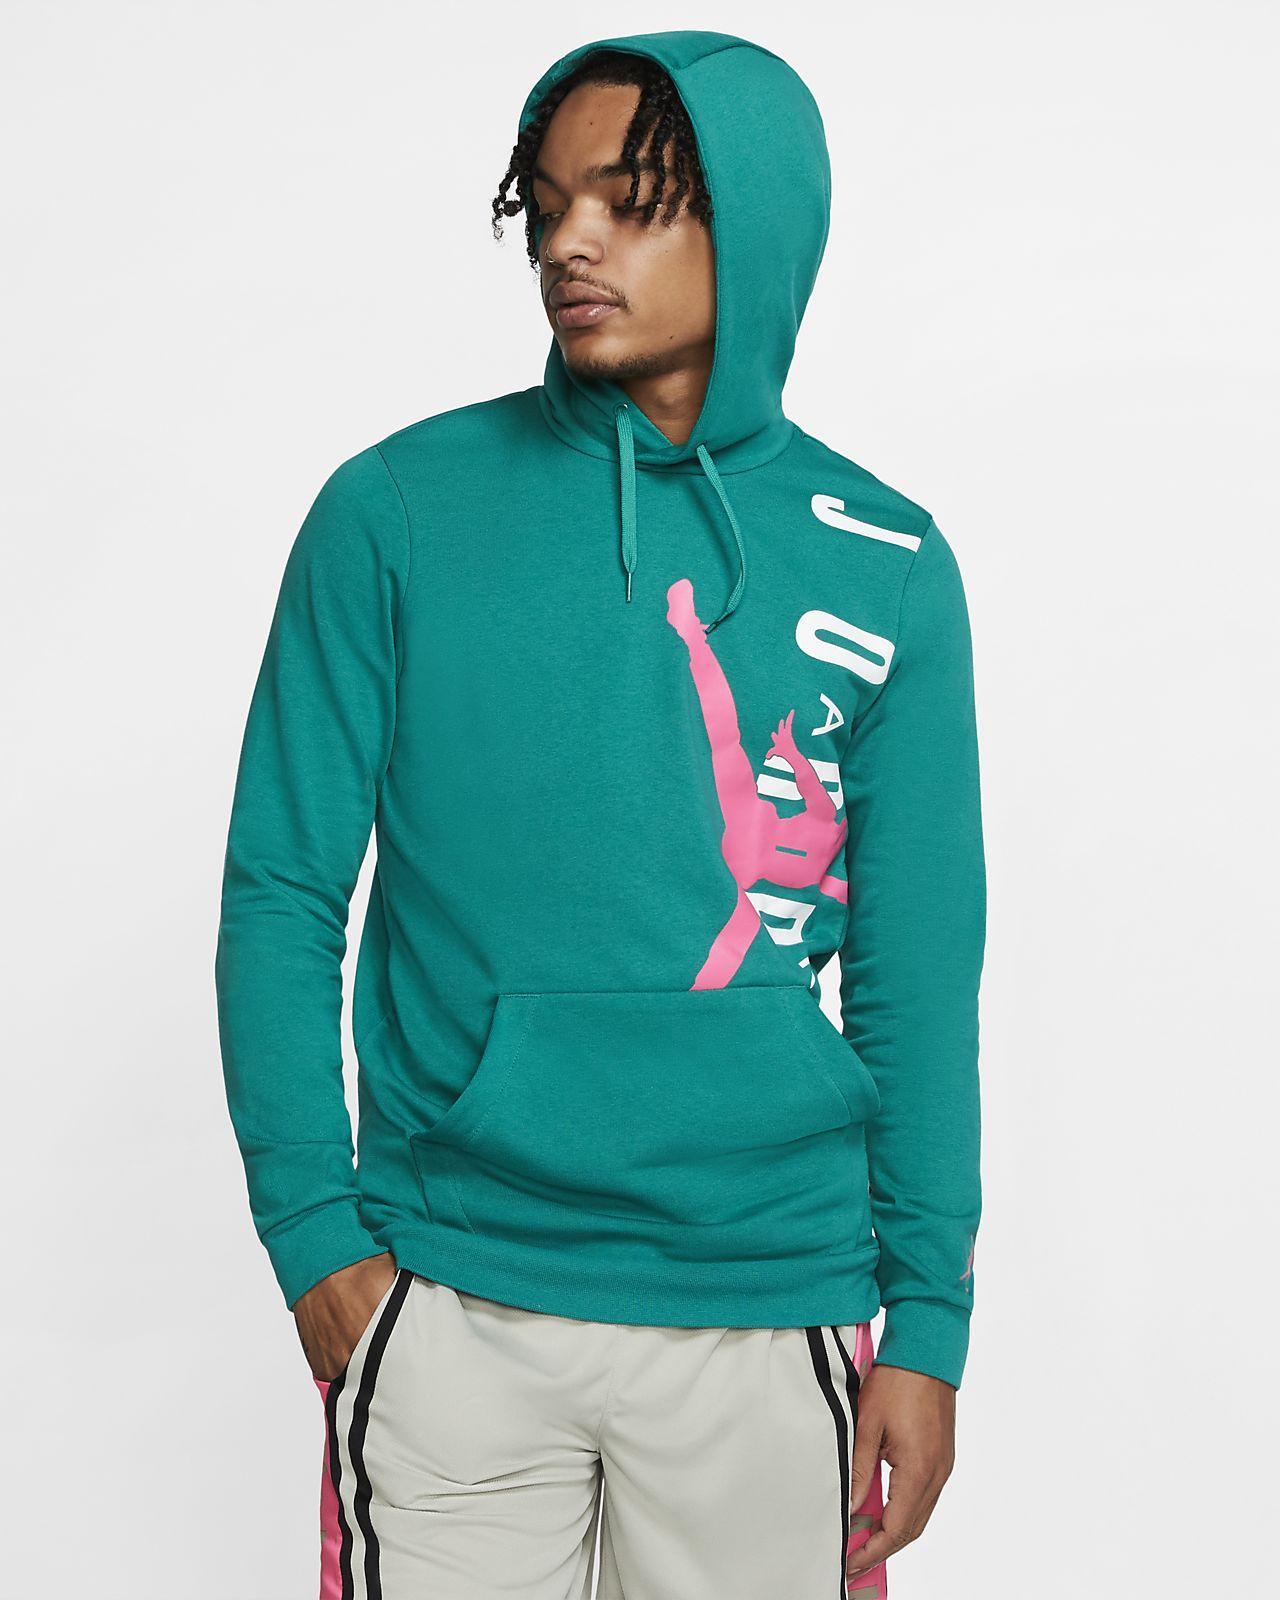 ef23ef4473c Jordan Jumpman Air Lightweight Men's Fleece Sweatshirt. Nike.com GB